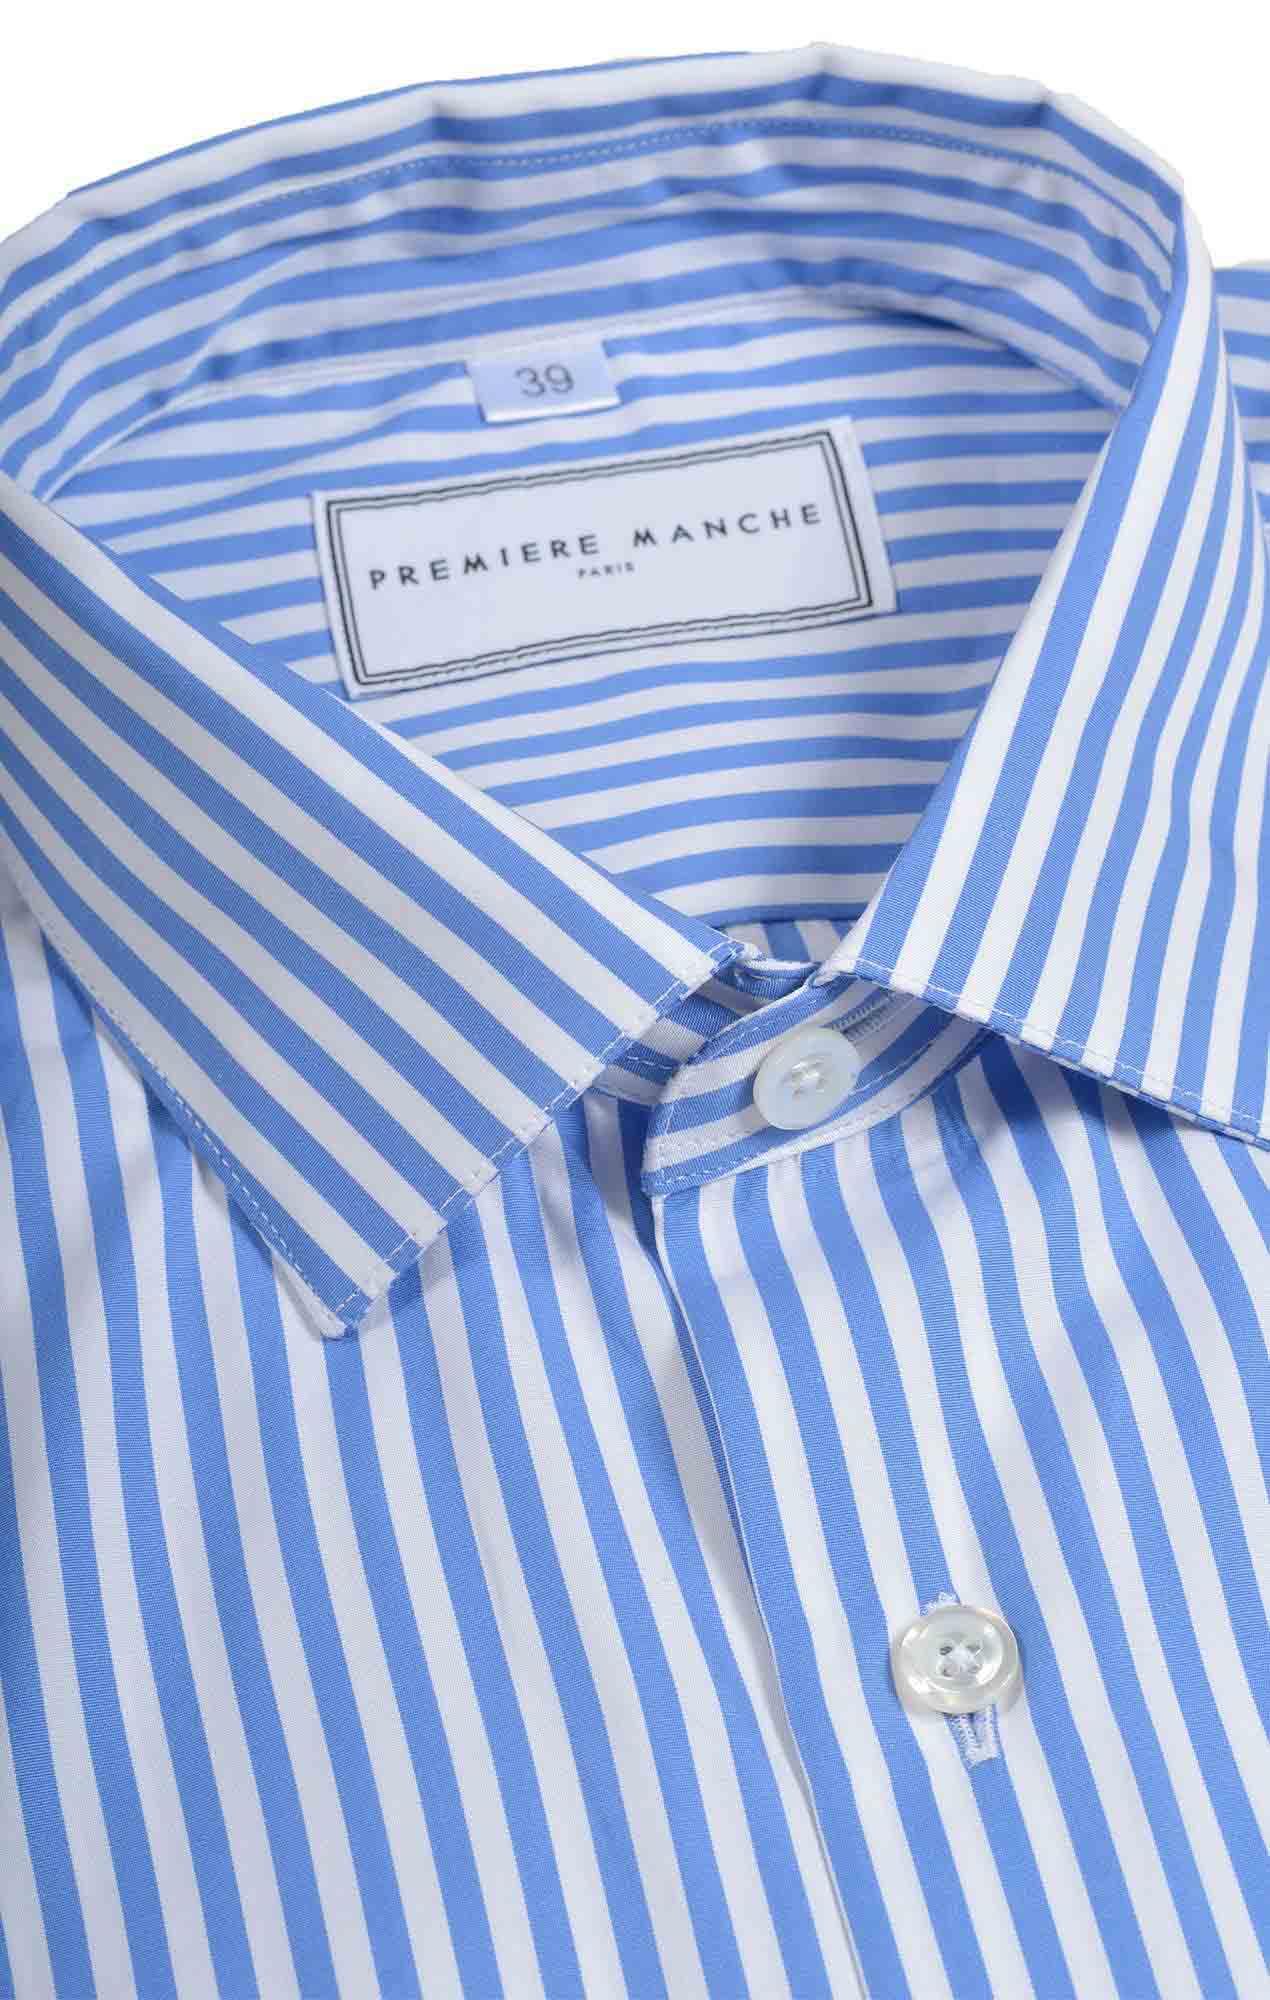 Blue poplin striped shirt